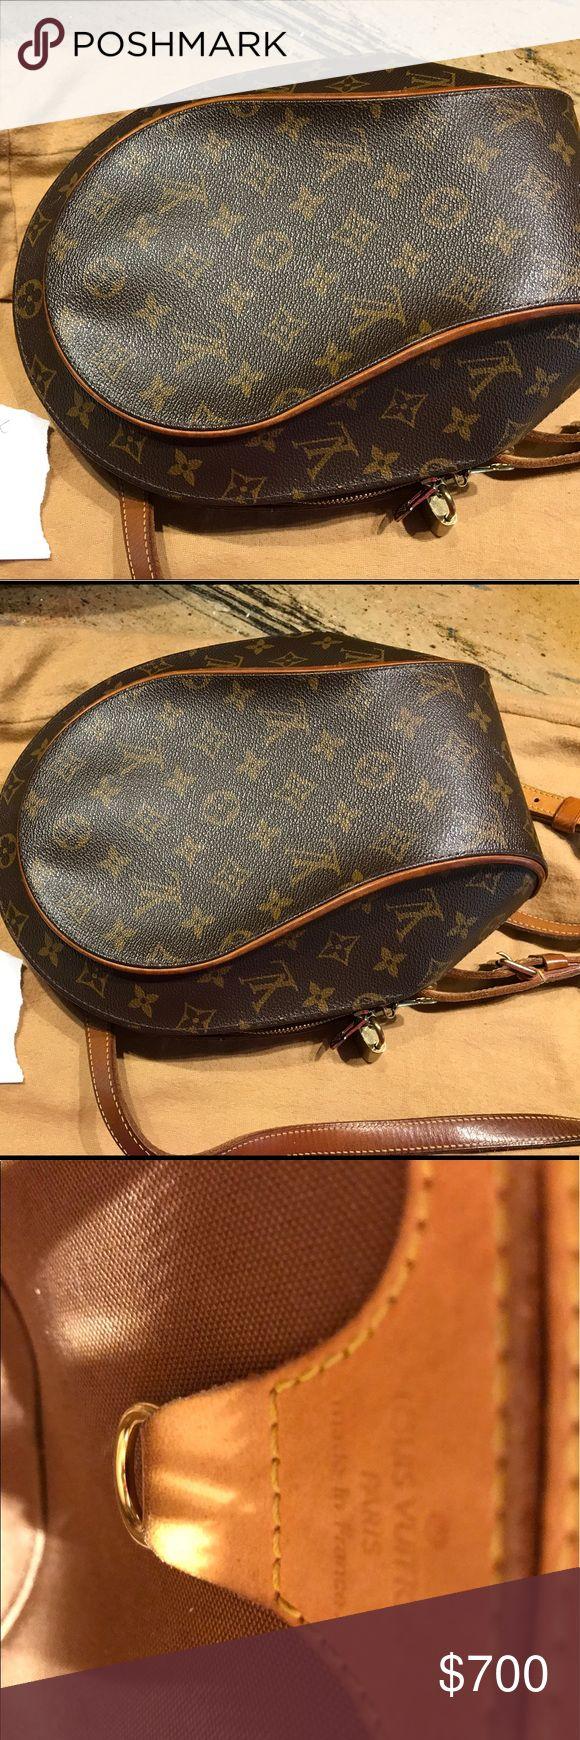 LOUIS VUITTON Monogram Ellipse Sac a Dos Backpack This is an authentic LOUIS VUITTON Monogram Ellipse Sac a Dos Backpack. This chic backpack is crafted of classic Louis Vuitton monogram coated canvas Louis Vuitton Bags Backpacks